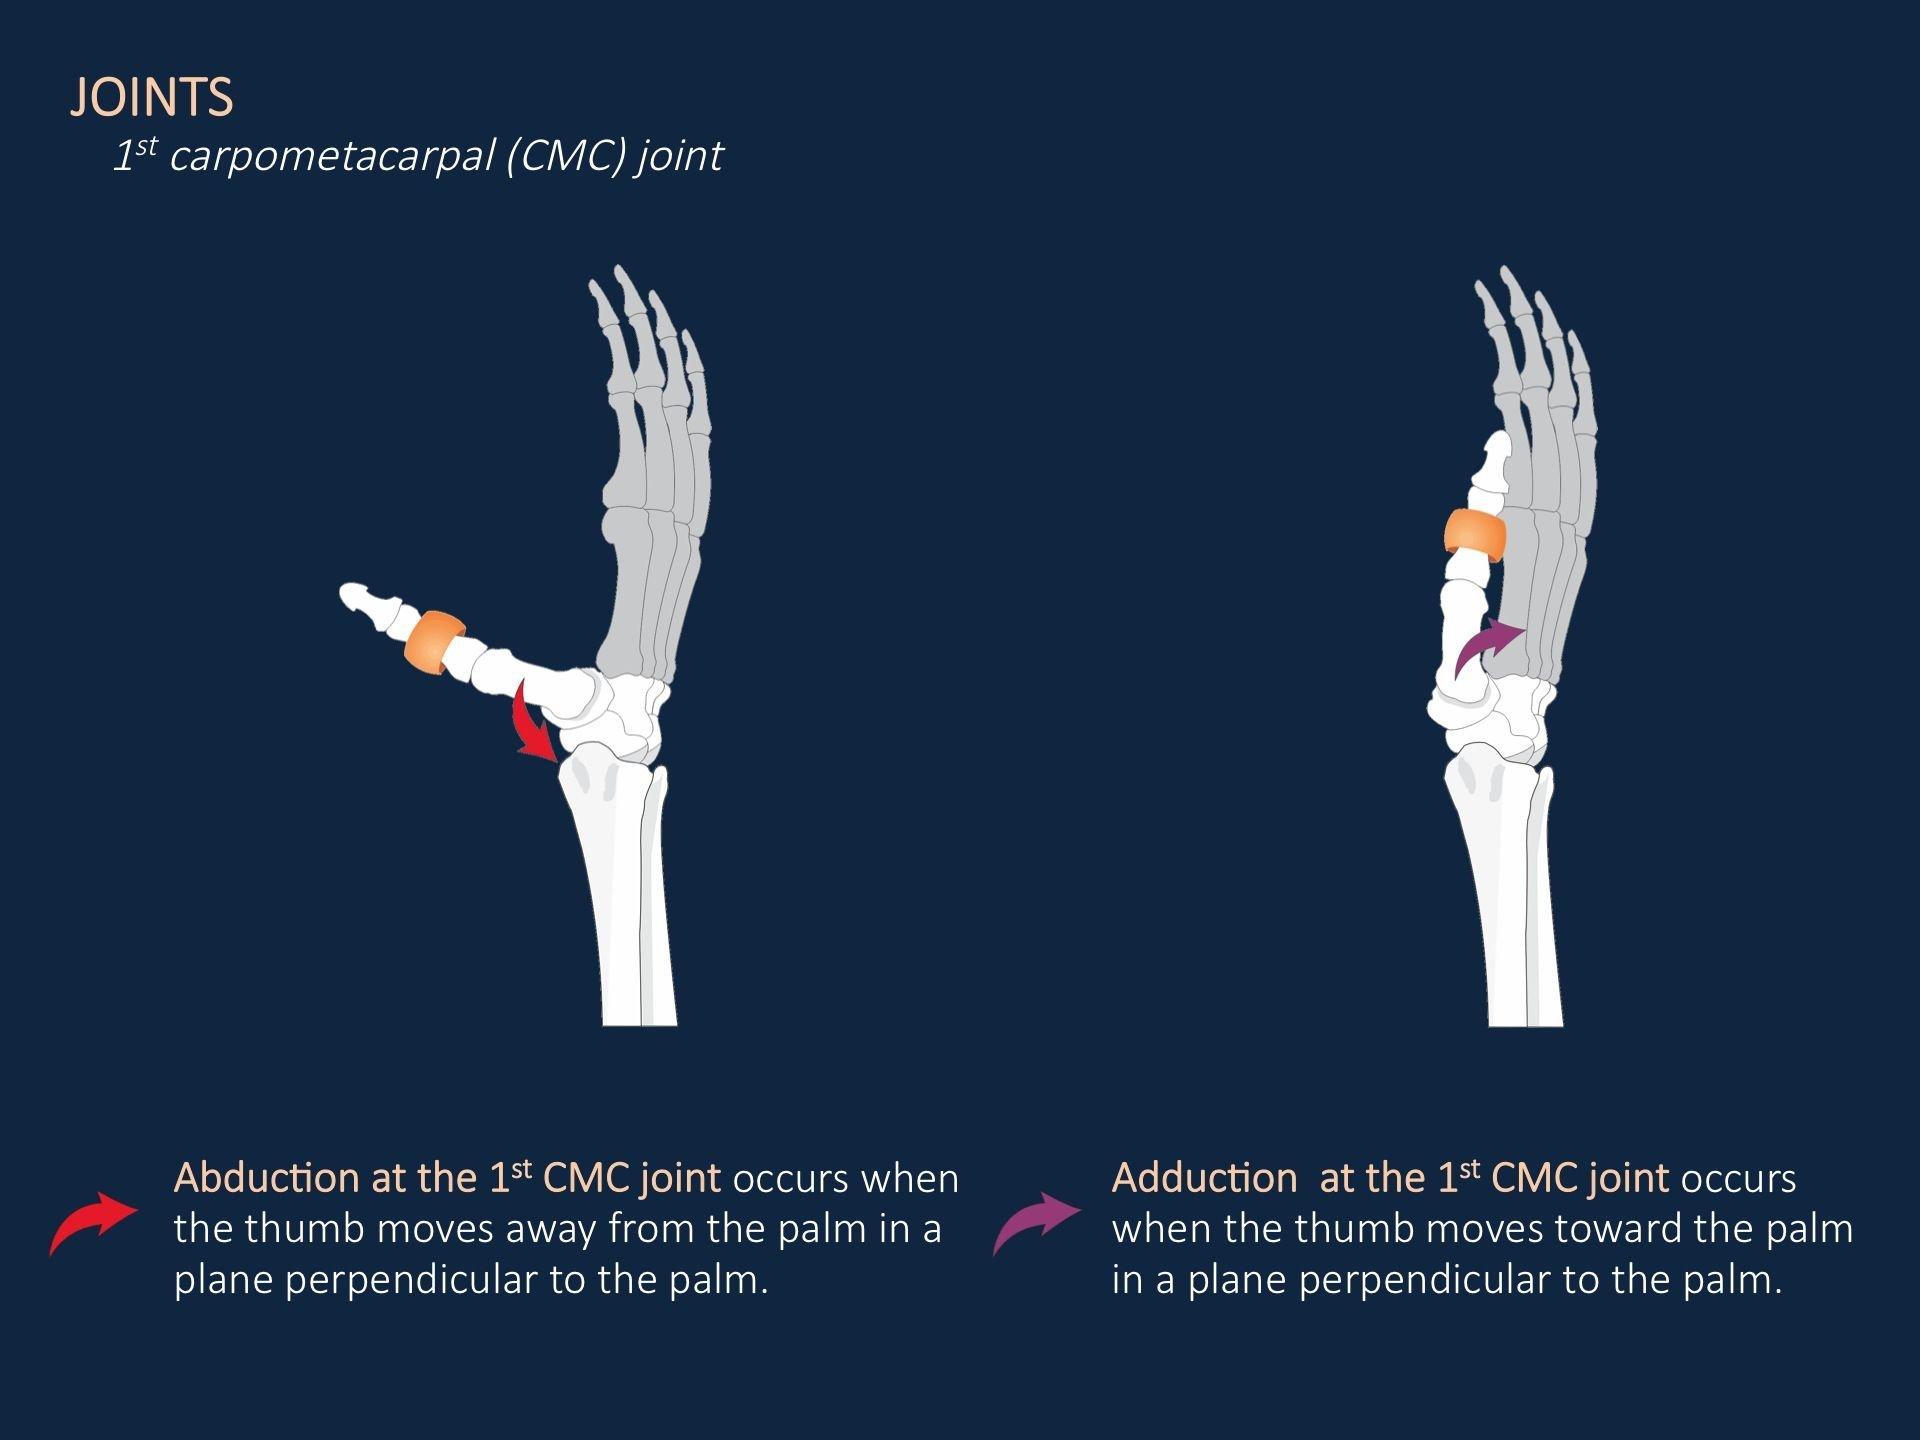 1st carpometacarpal CMC joint Case Background Joints AT1x 1920x1440